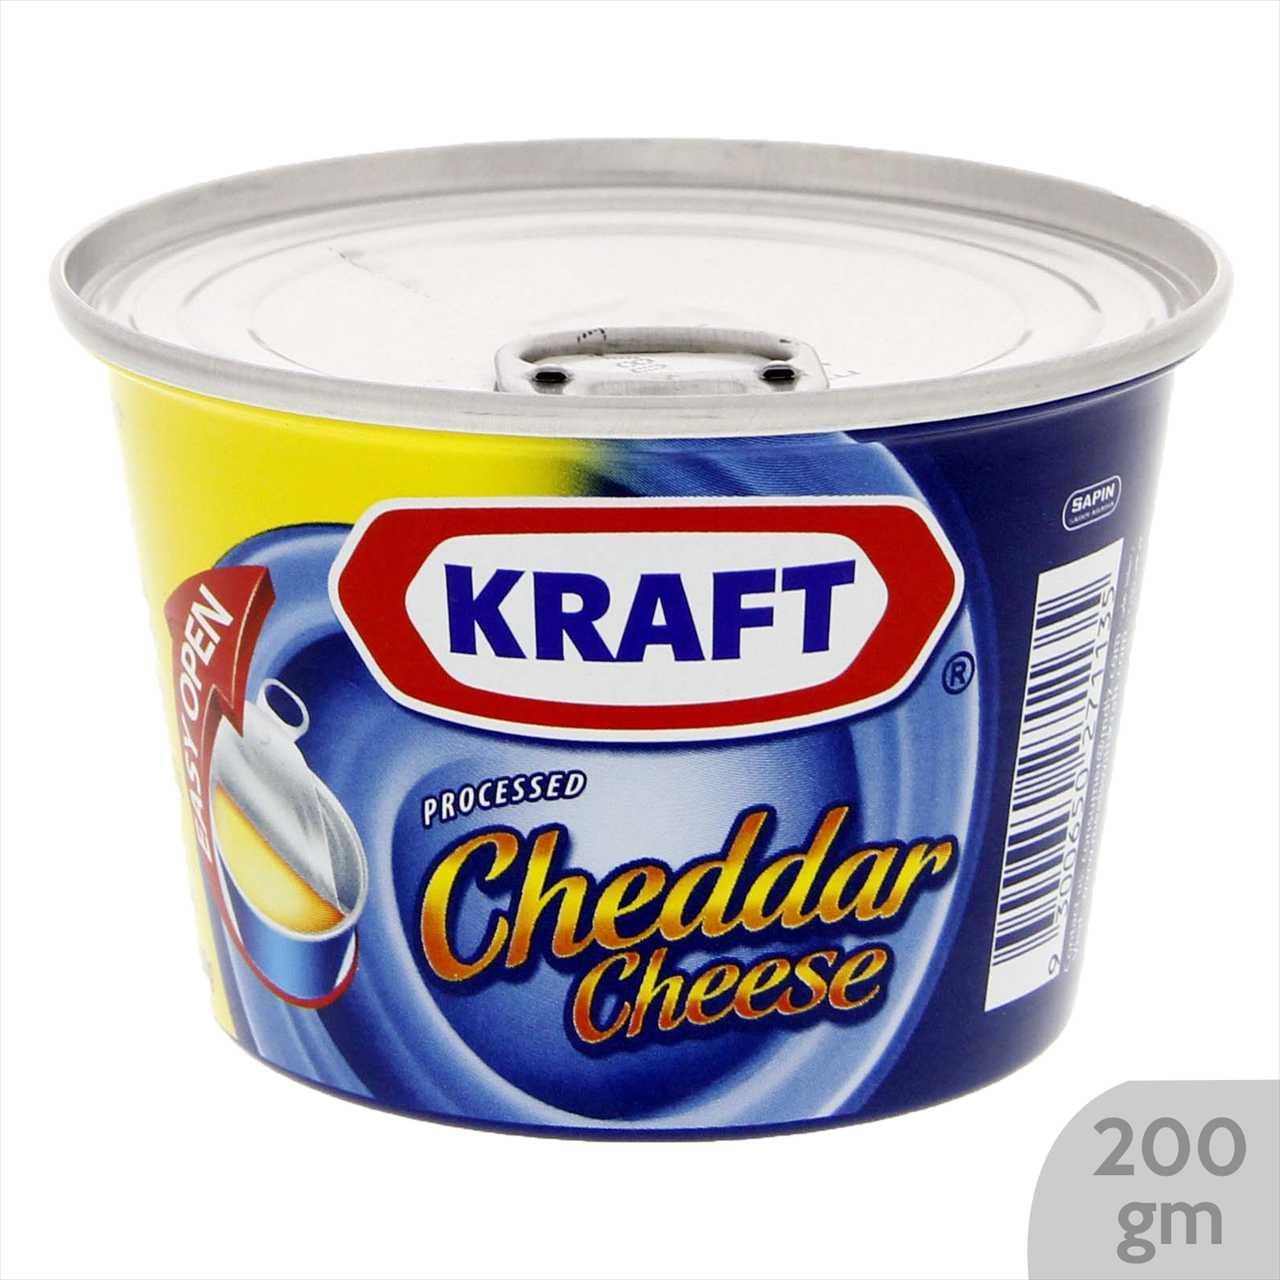 Kraft Processed Cheddar Cheese Tin 190 gm